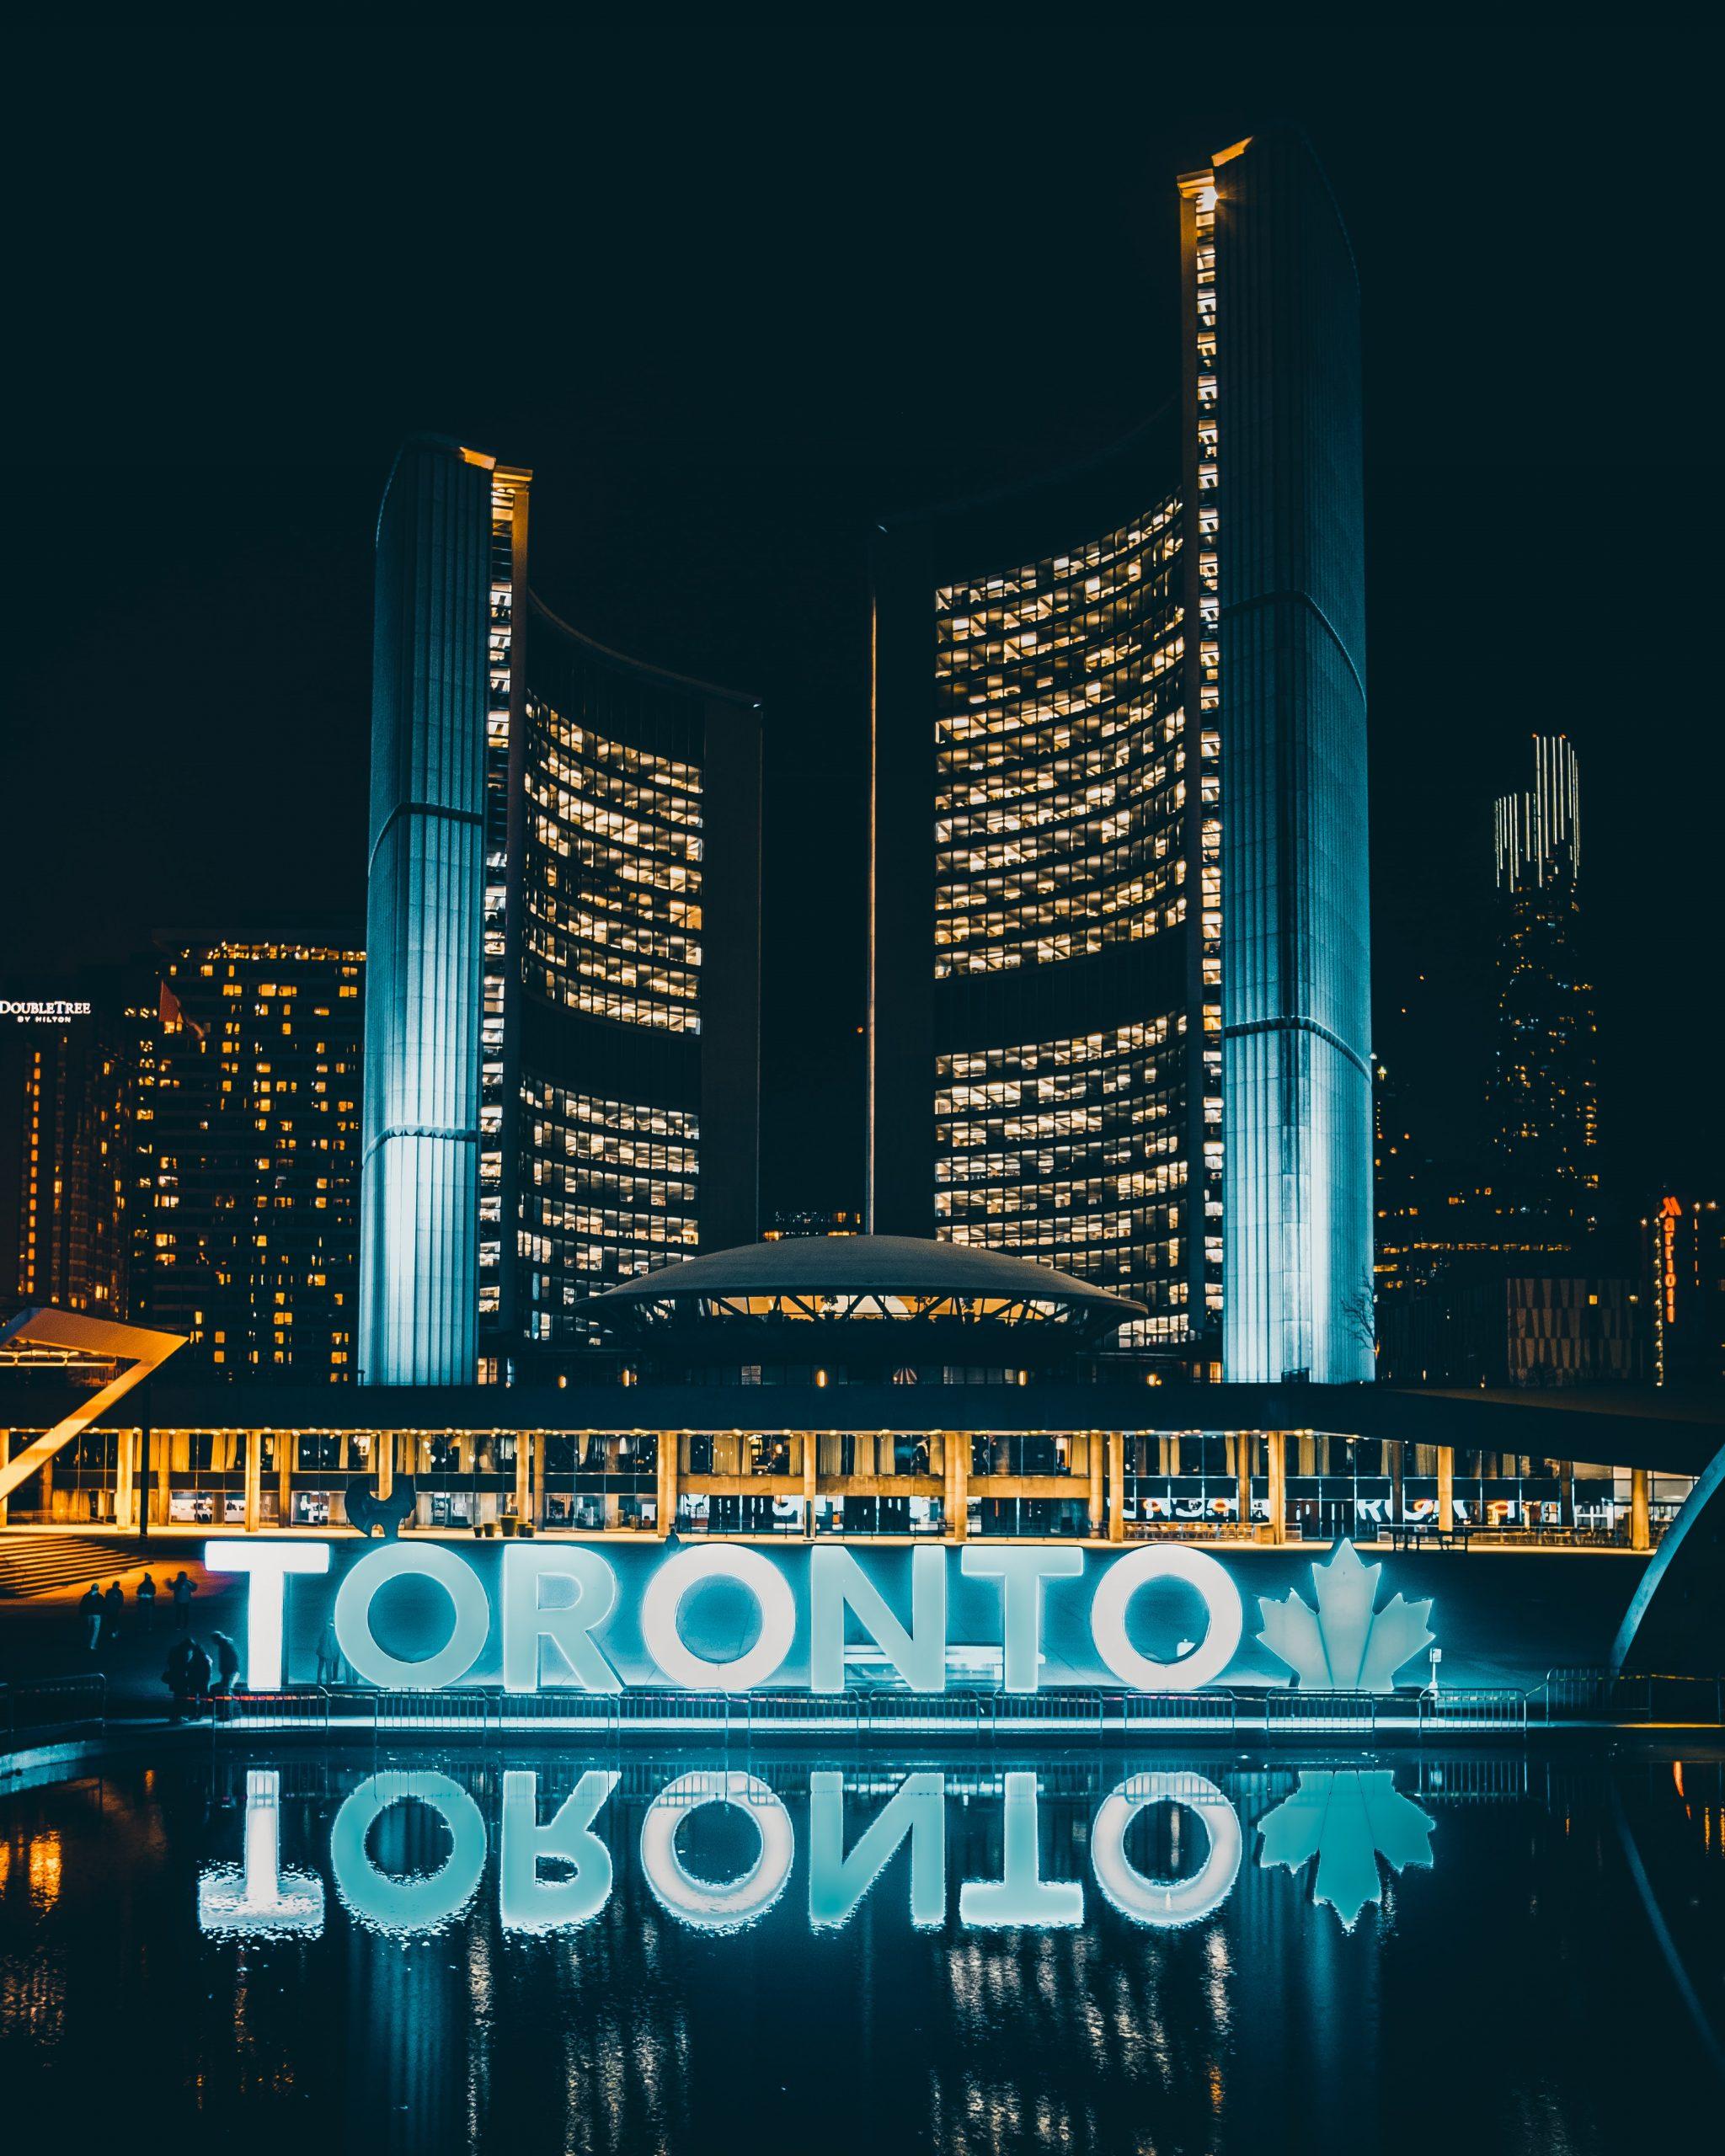 The Most Expensive Neighborhoods in Toronto